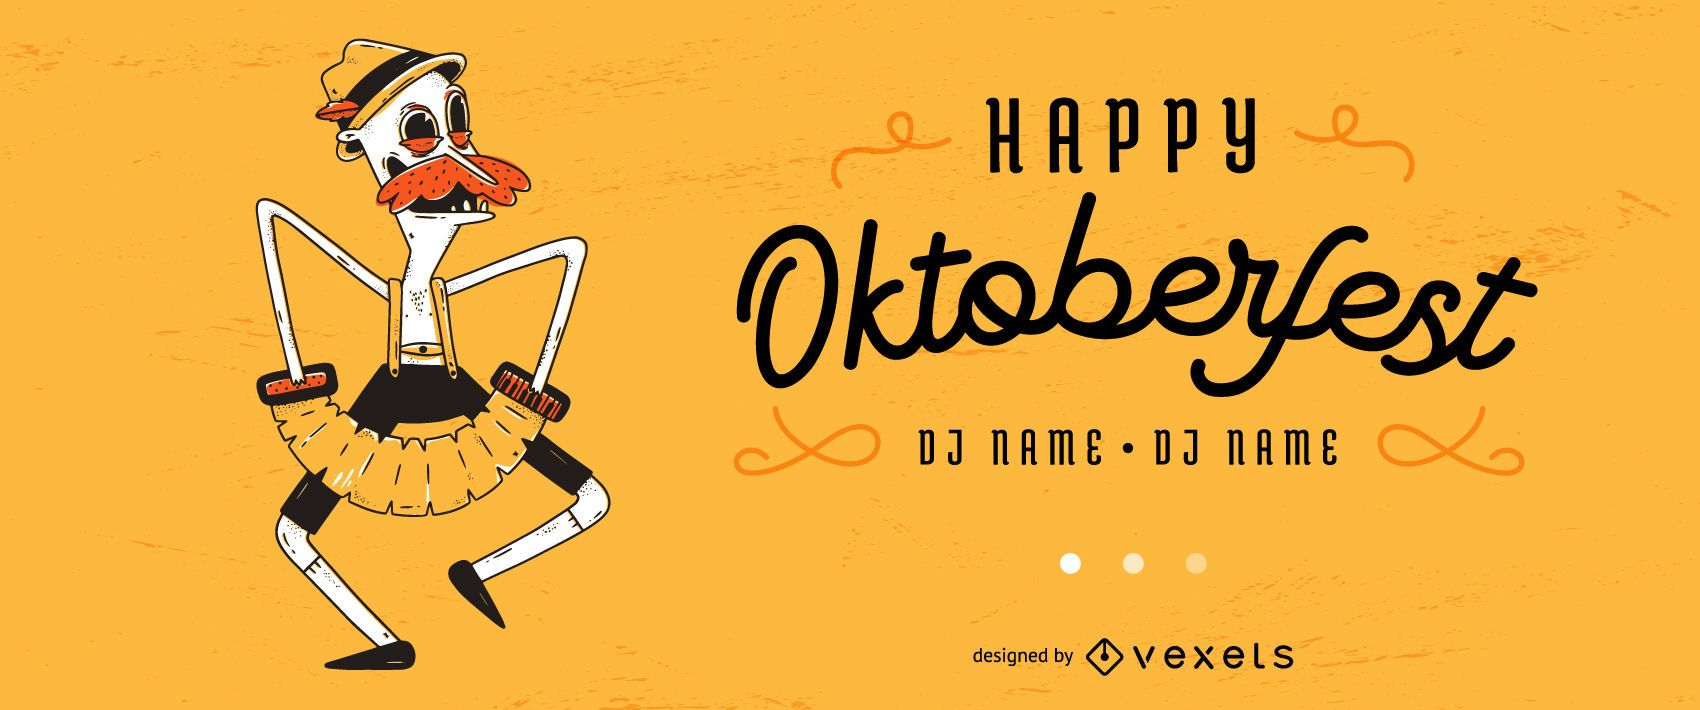 Oktoberfest Editable Slide Vector Design